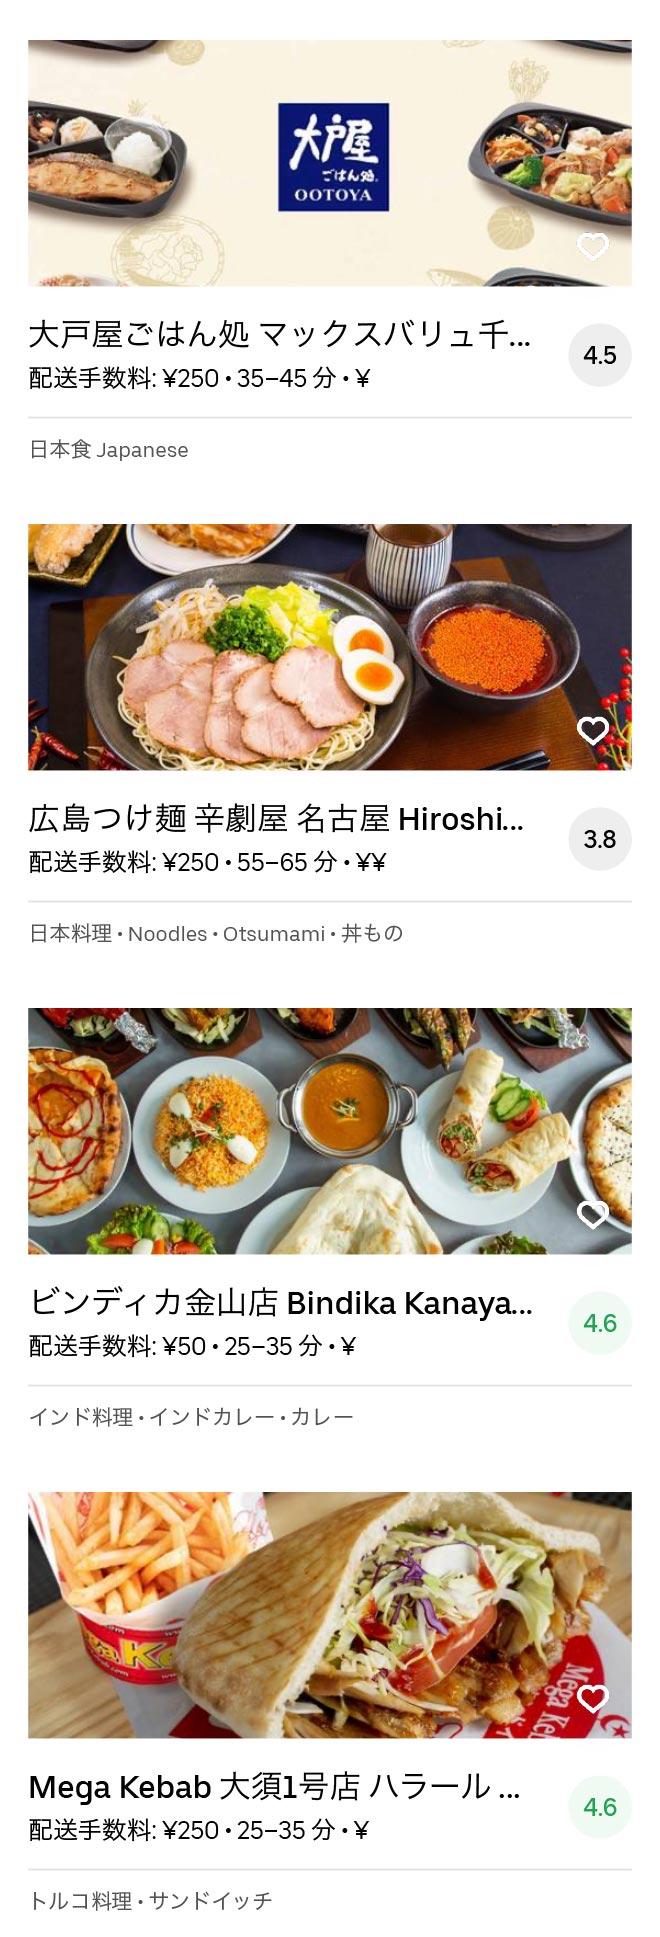 Nagoya jingumae menu 2005 06